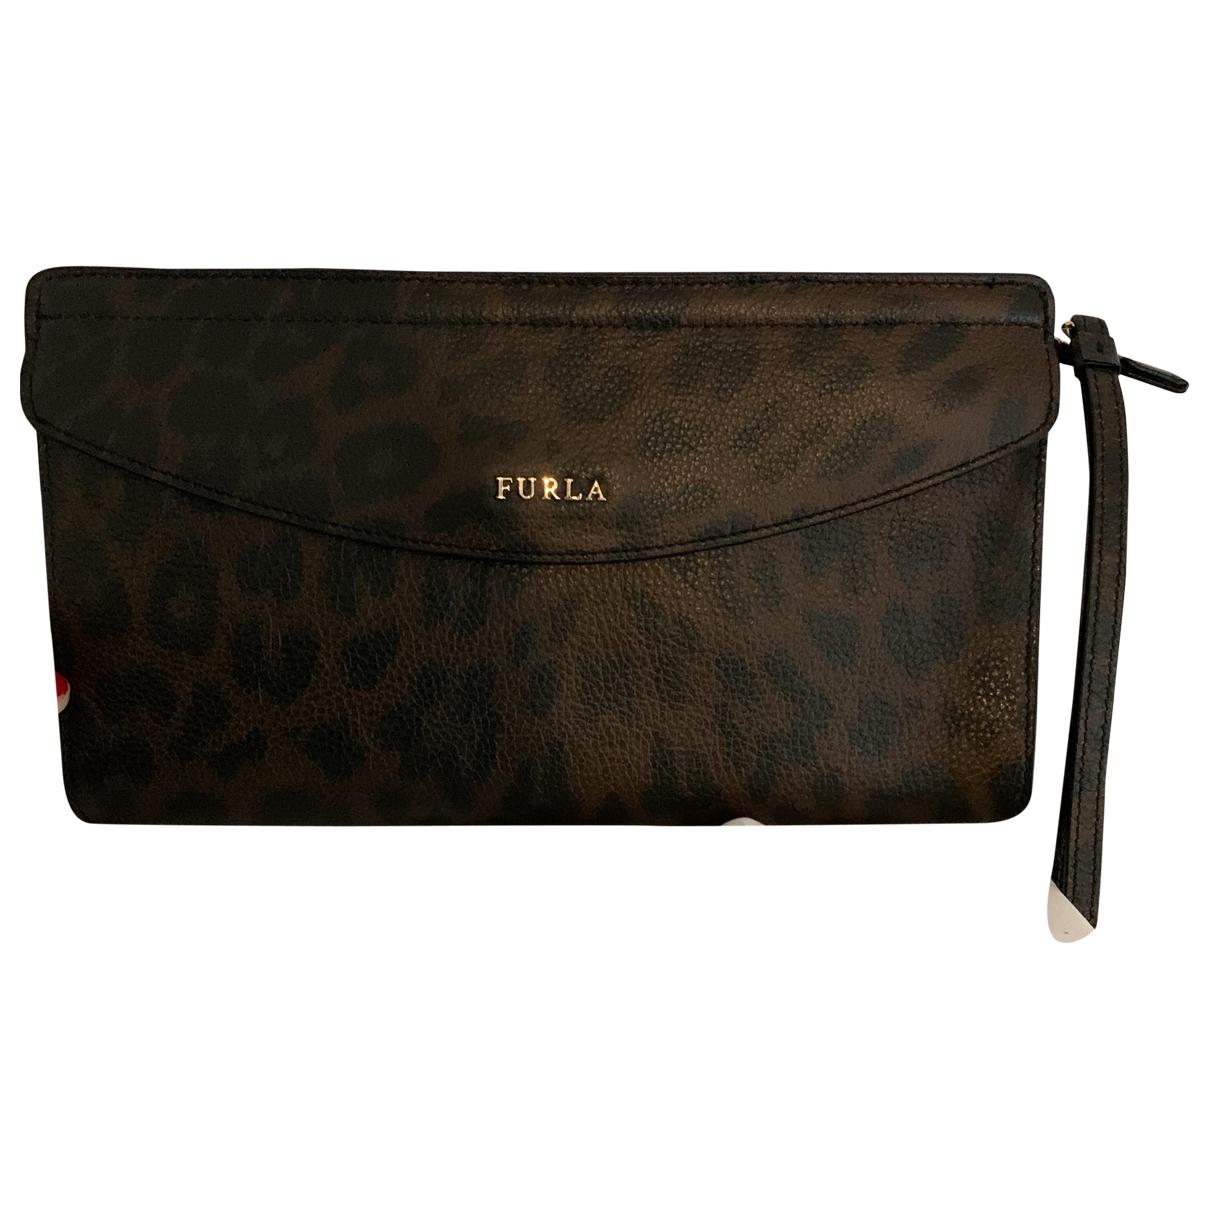 Furla \N Brown Leather Clutch bag for Women \N